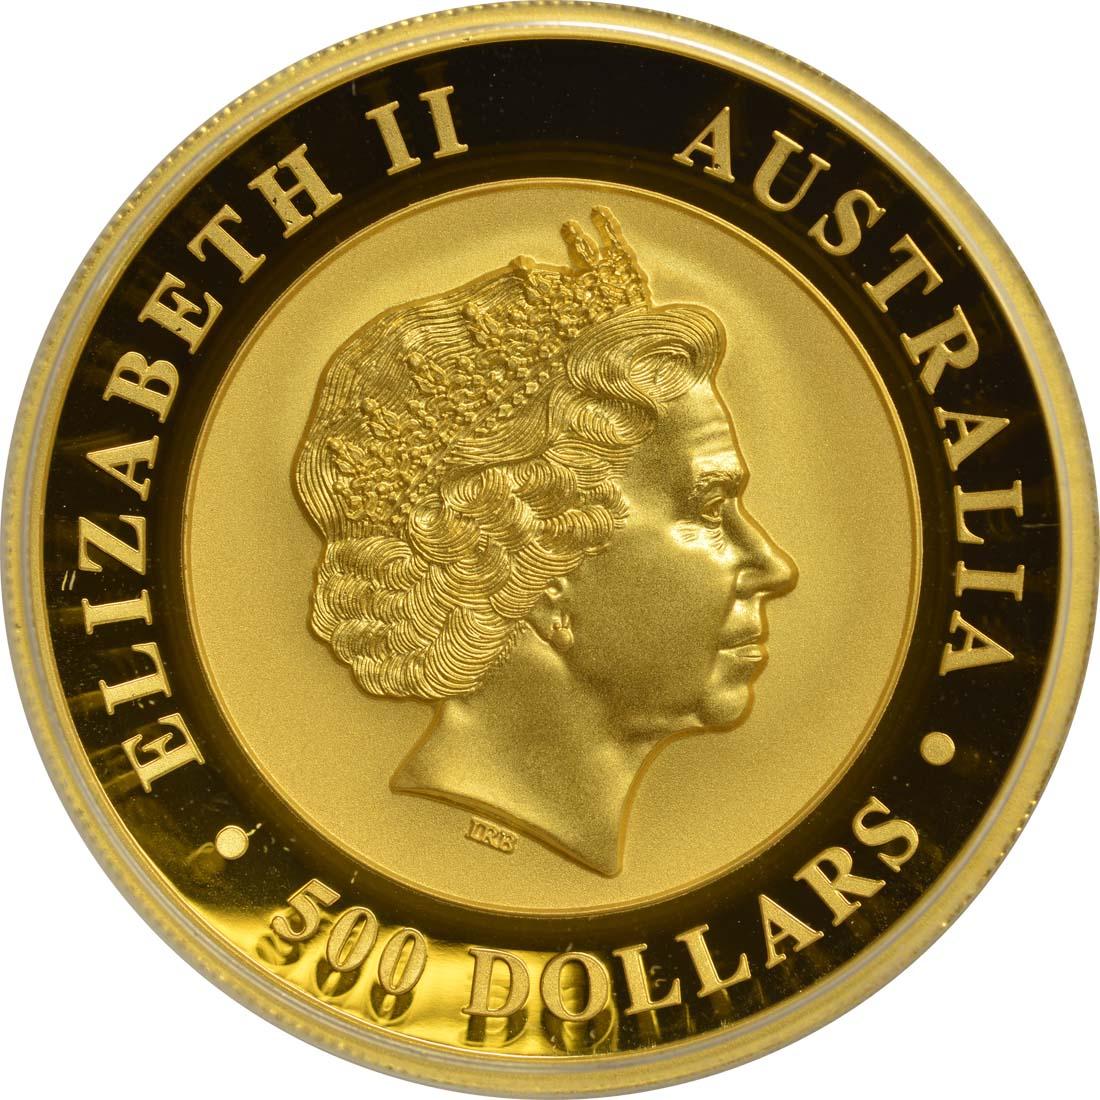 australien 500 dollar kimberley sunrise 2 oz gold mit diamant highrelief 2016 gold pp 3999 euro. Black Bedroom Furniture Sets. Home Design Ideas